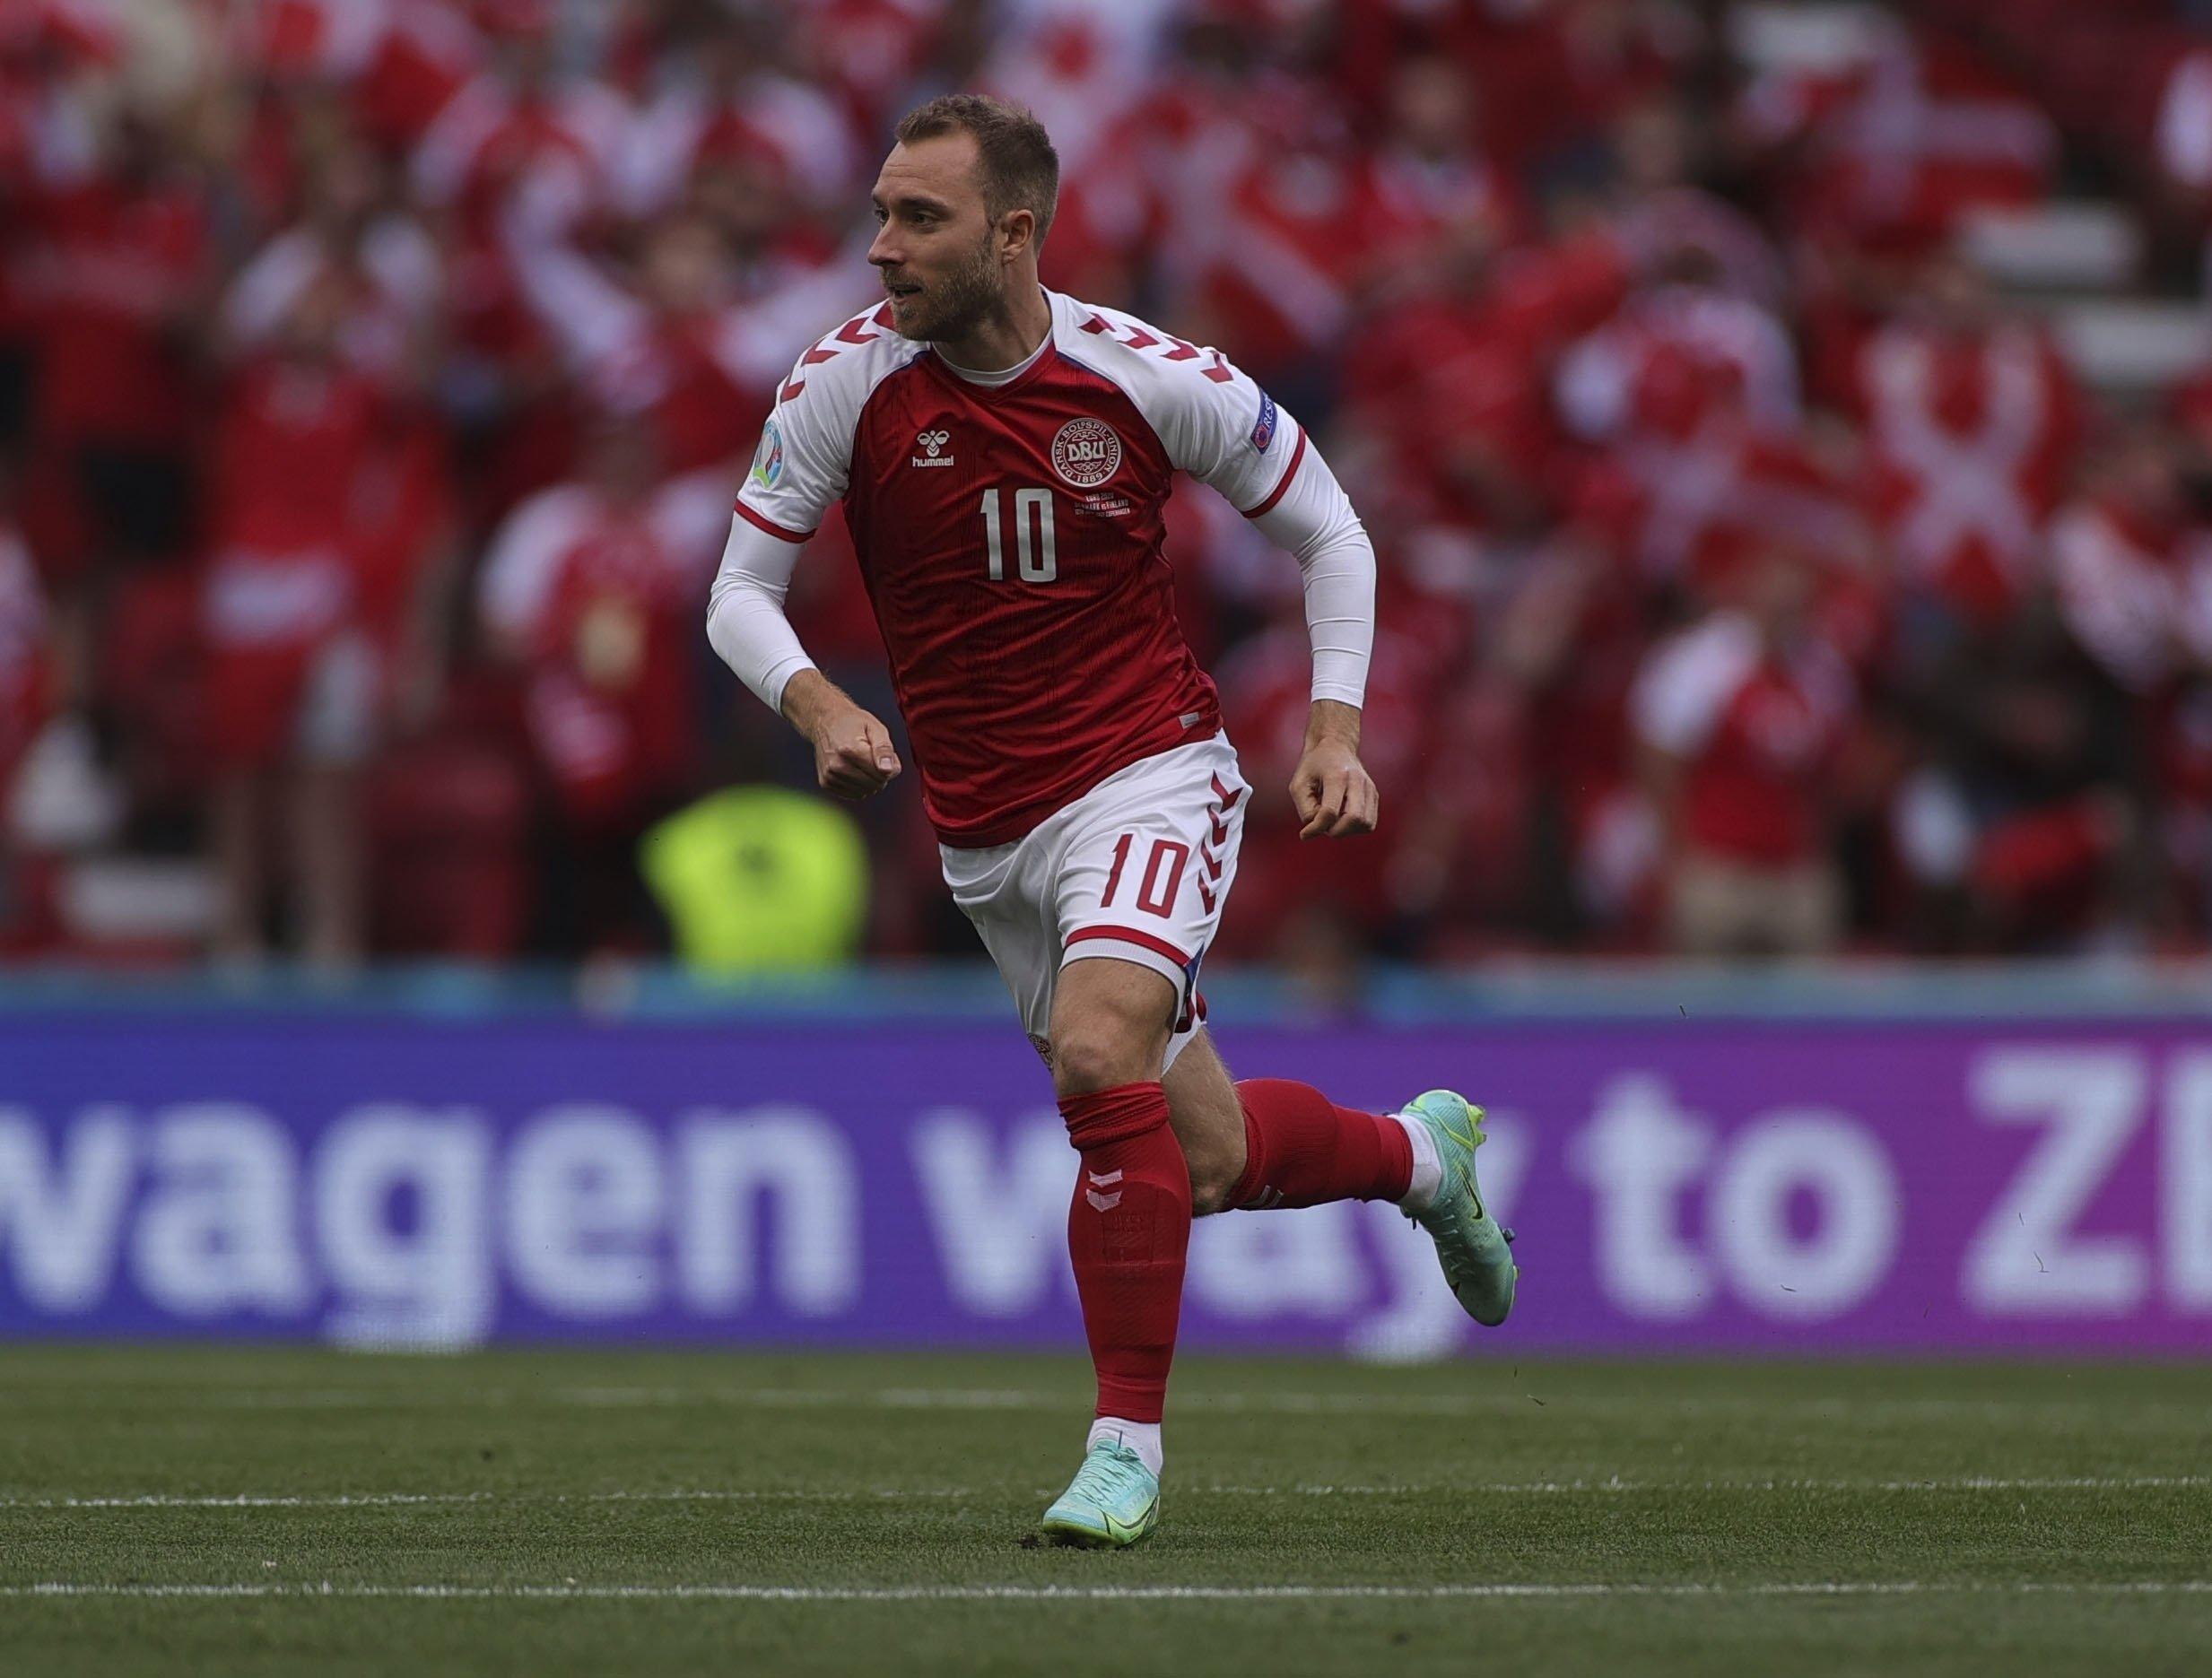 Denmark's Christian Eriksen runs during the Euro 2020 Group B match against Finland at Parken stadium, Copenhagen, Denmark, June 12, 2021. (AP Photo)